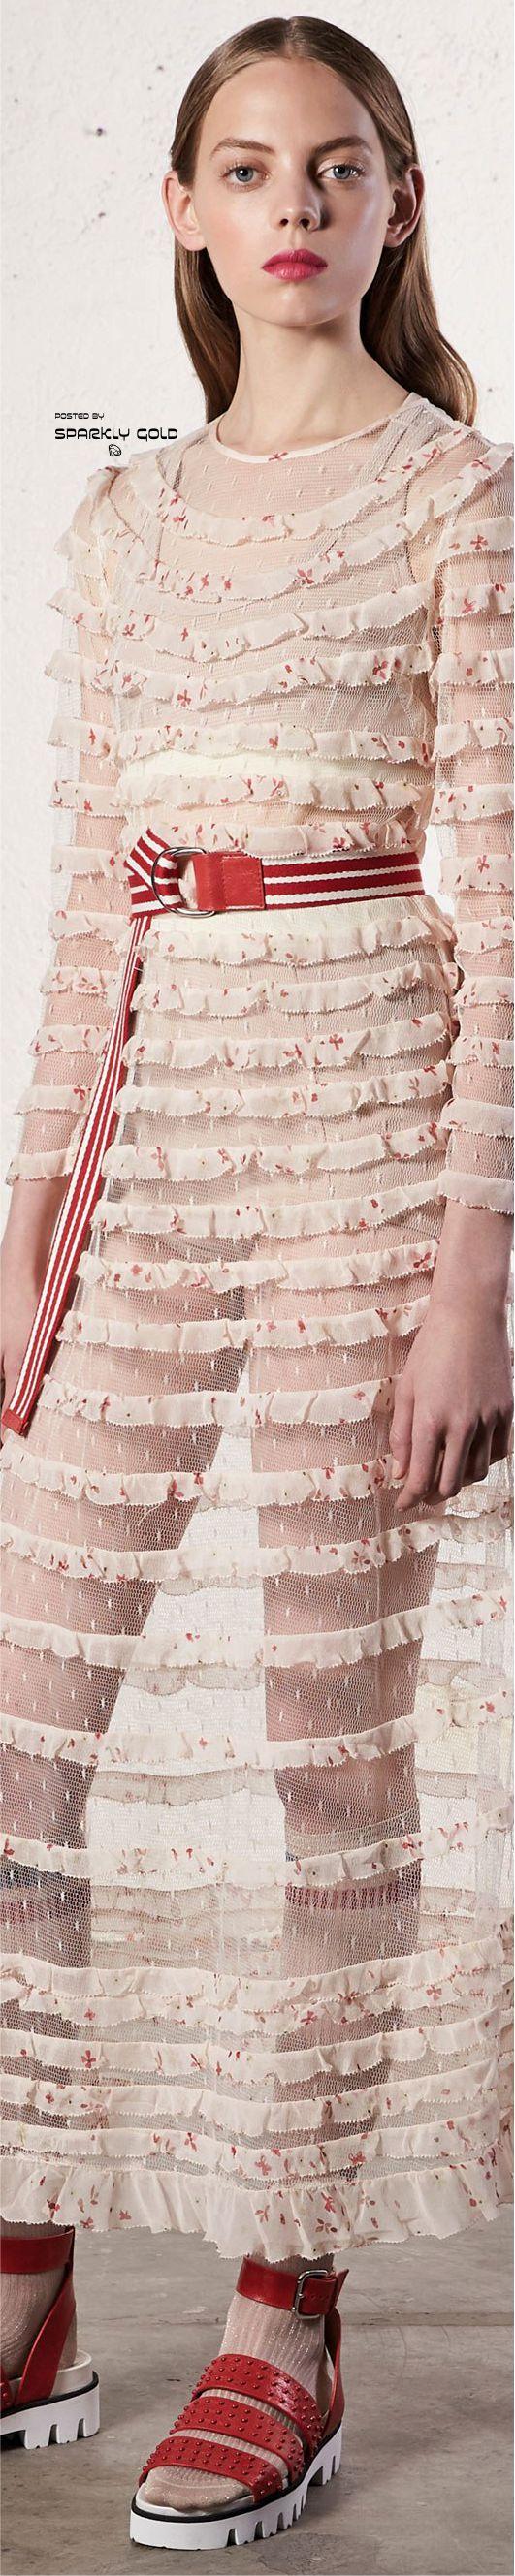 Pink dress design 2018  Red Valentino Resort   Fashion  Pinterest  Resorts Valentino